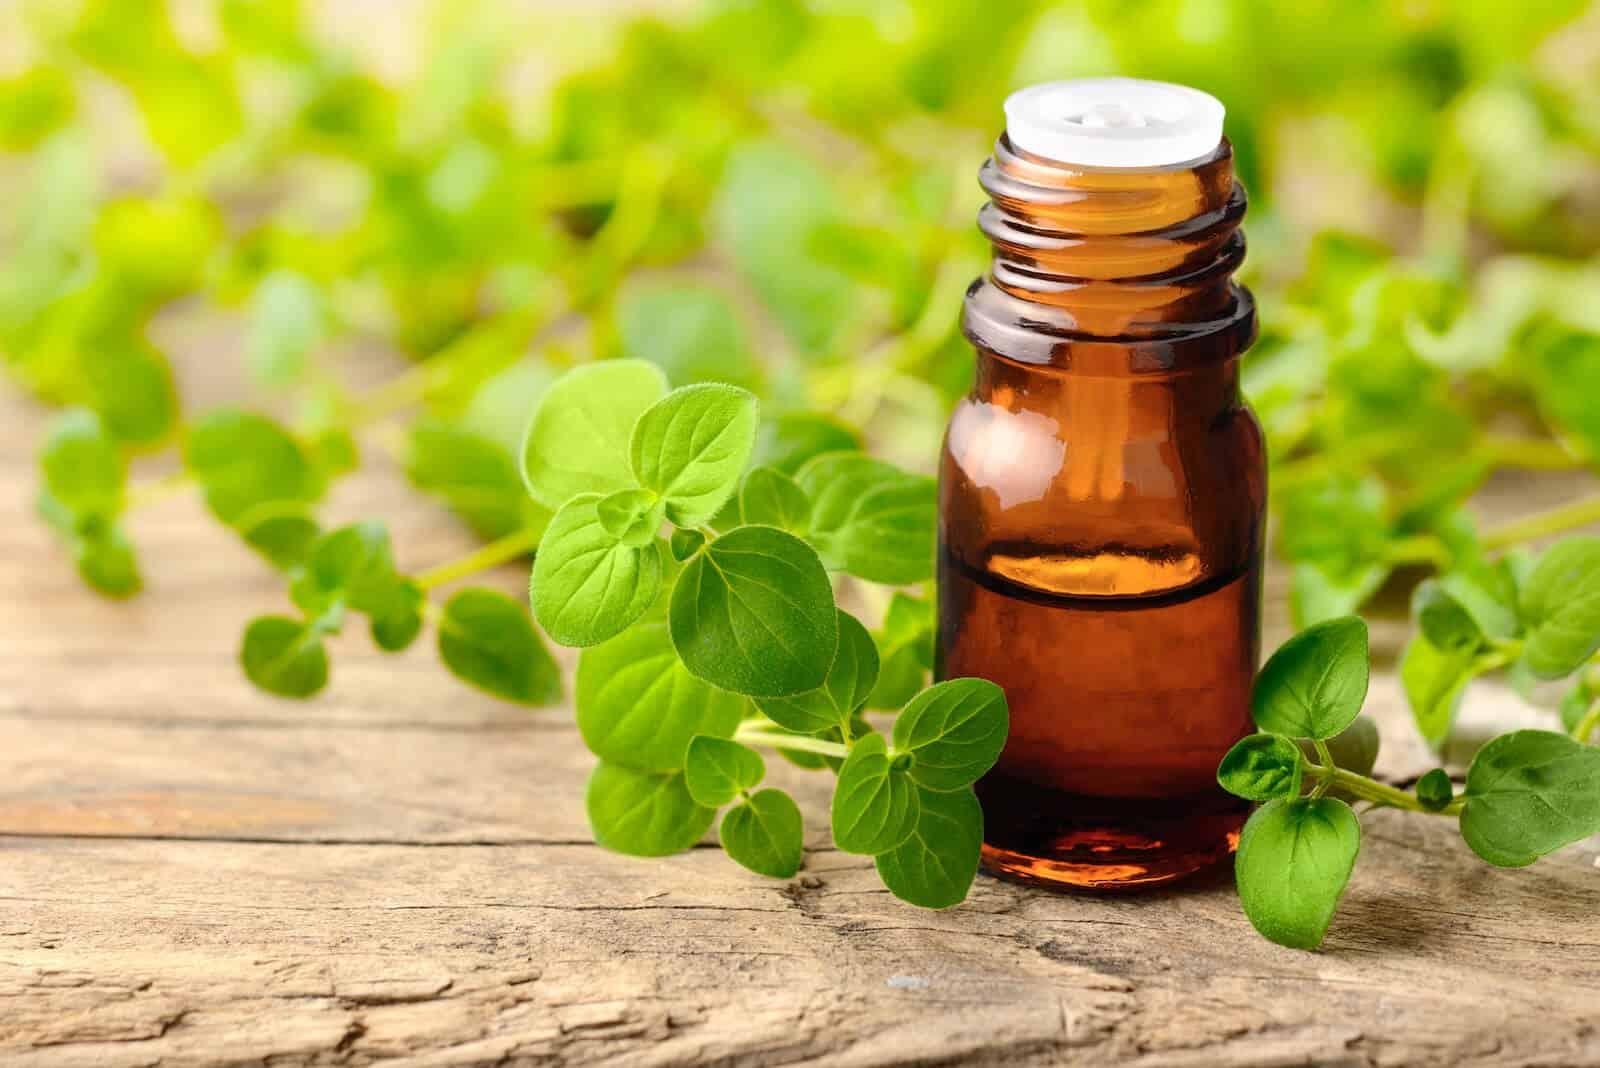 oil of oregano benefits: oregano oil and leaves